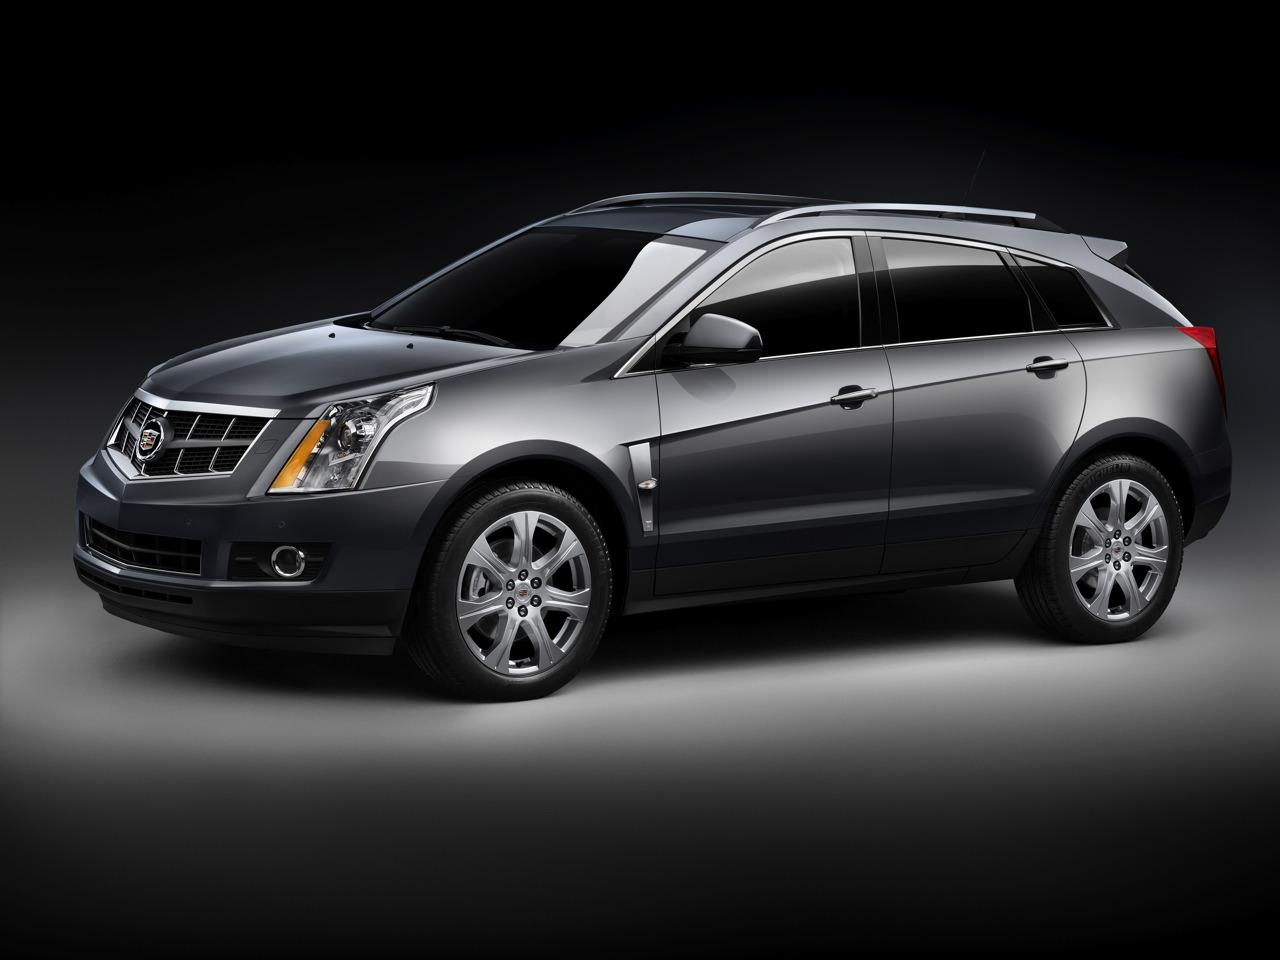 Cadillac SRX 2010-2013